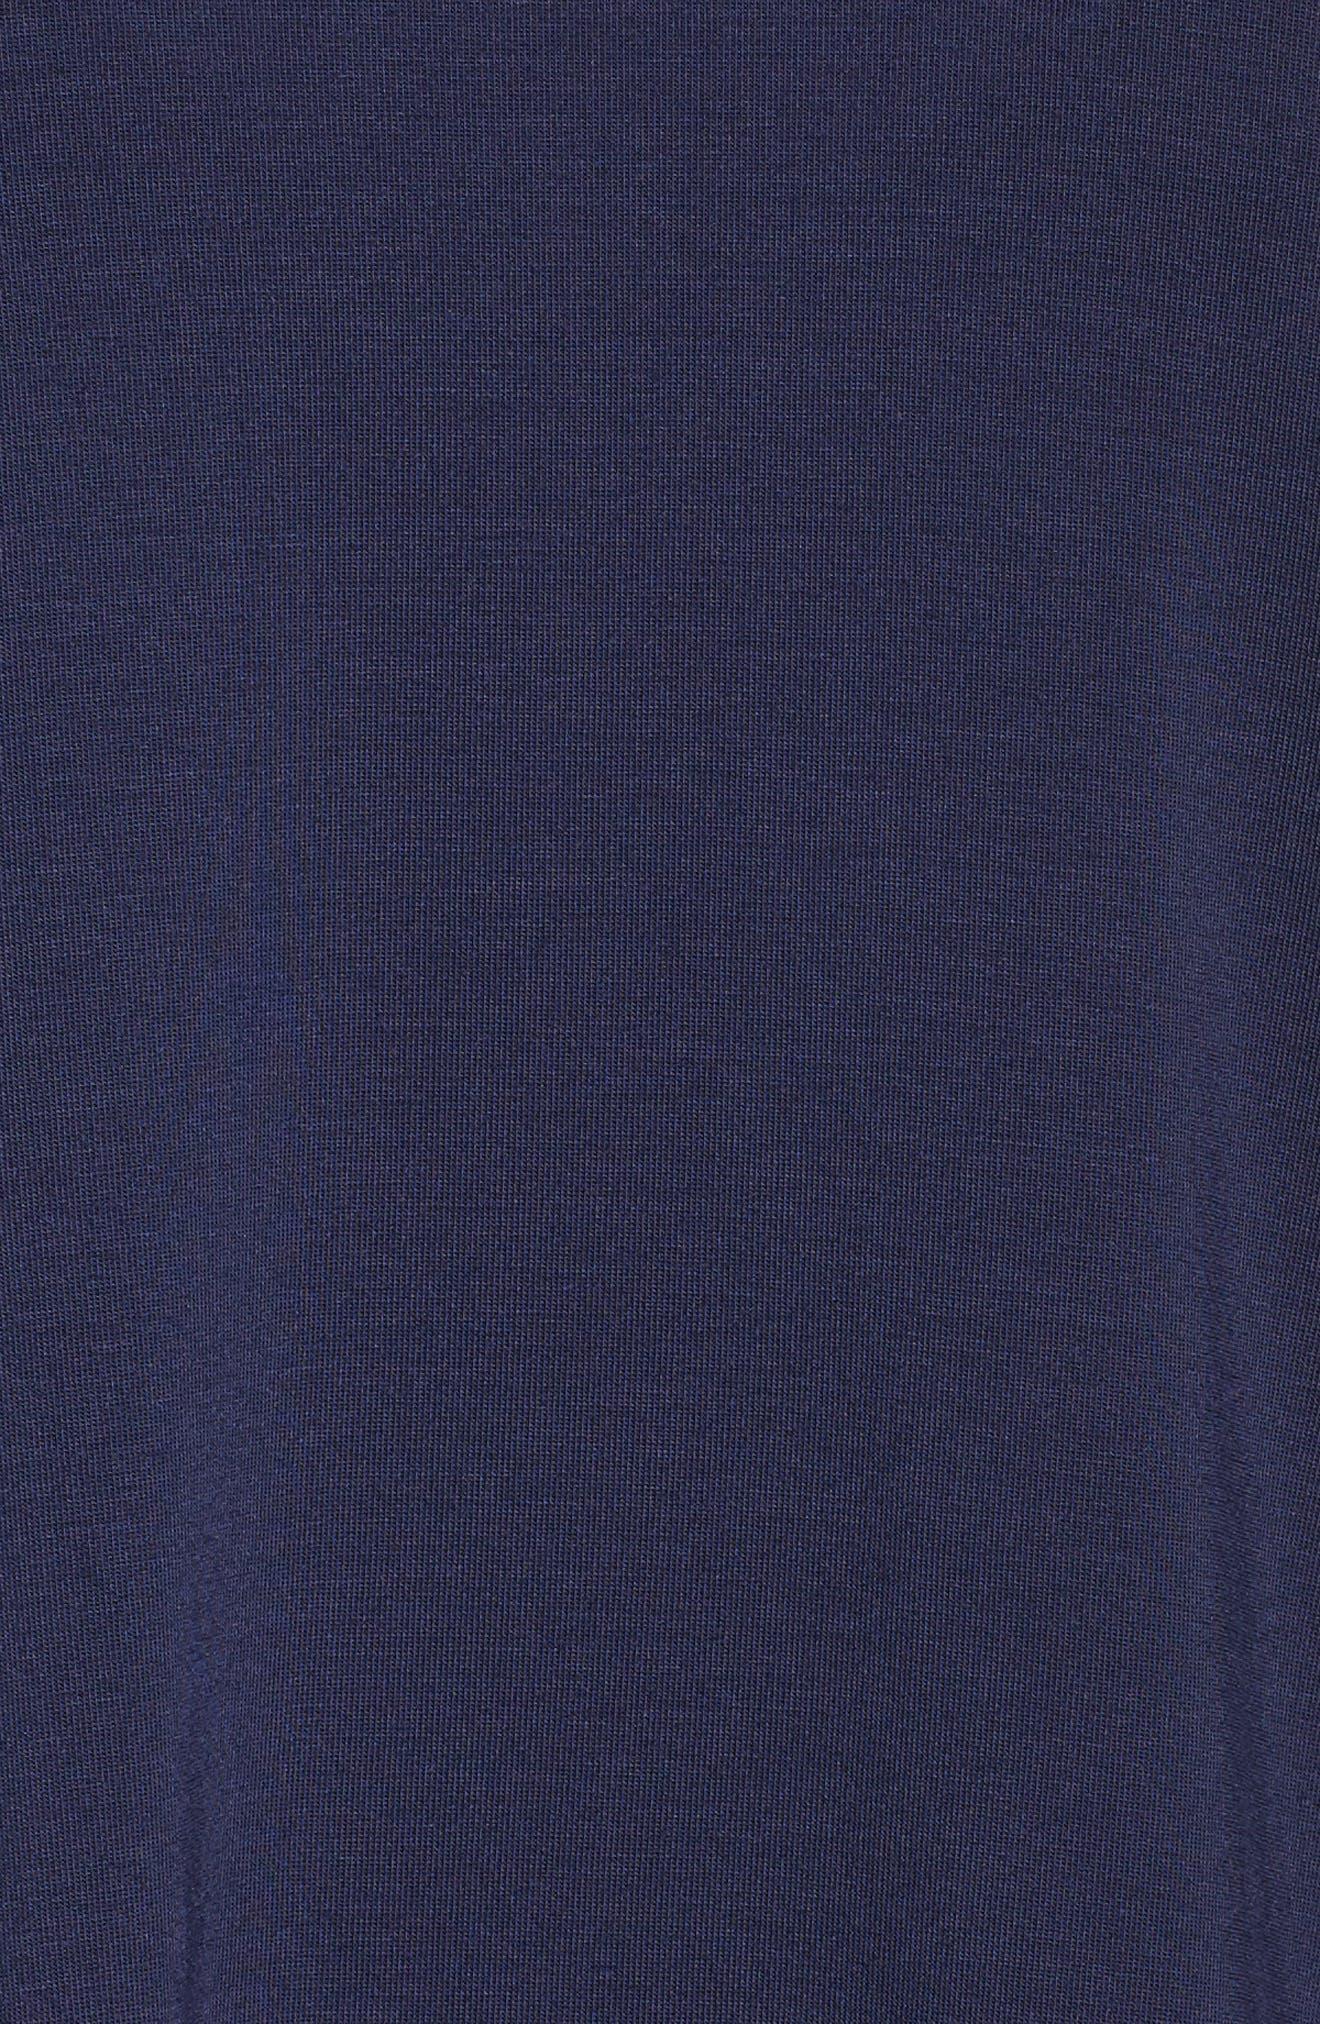 Jersey Pajamas,                             Alternate thumbnail 5, color,                             401